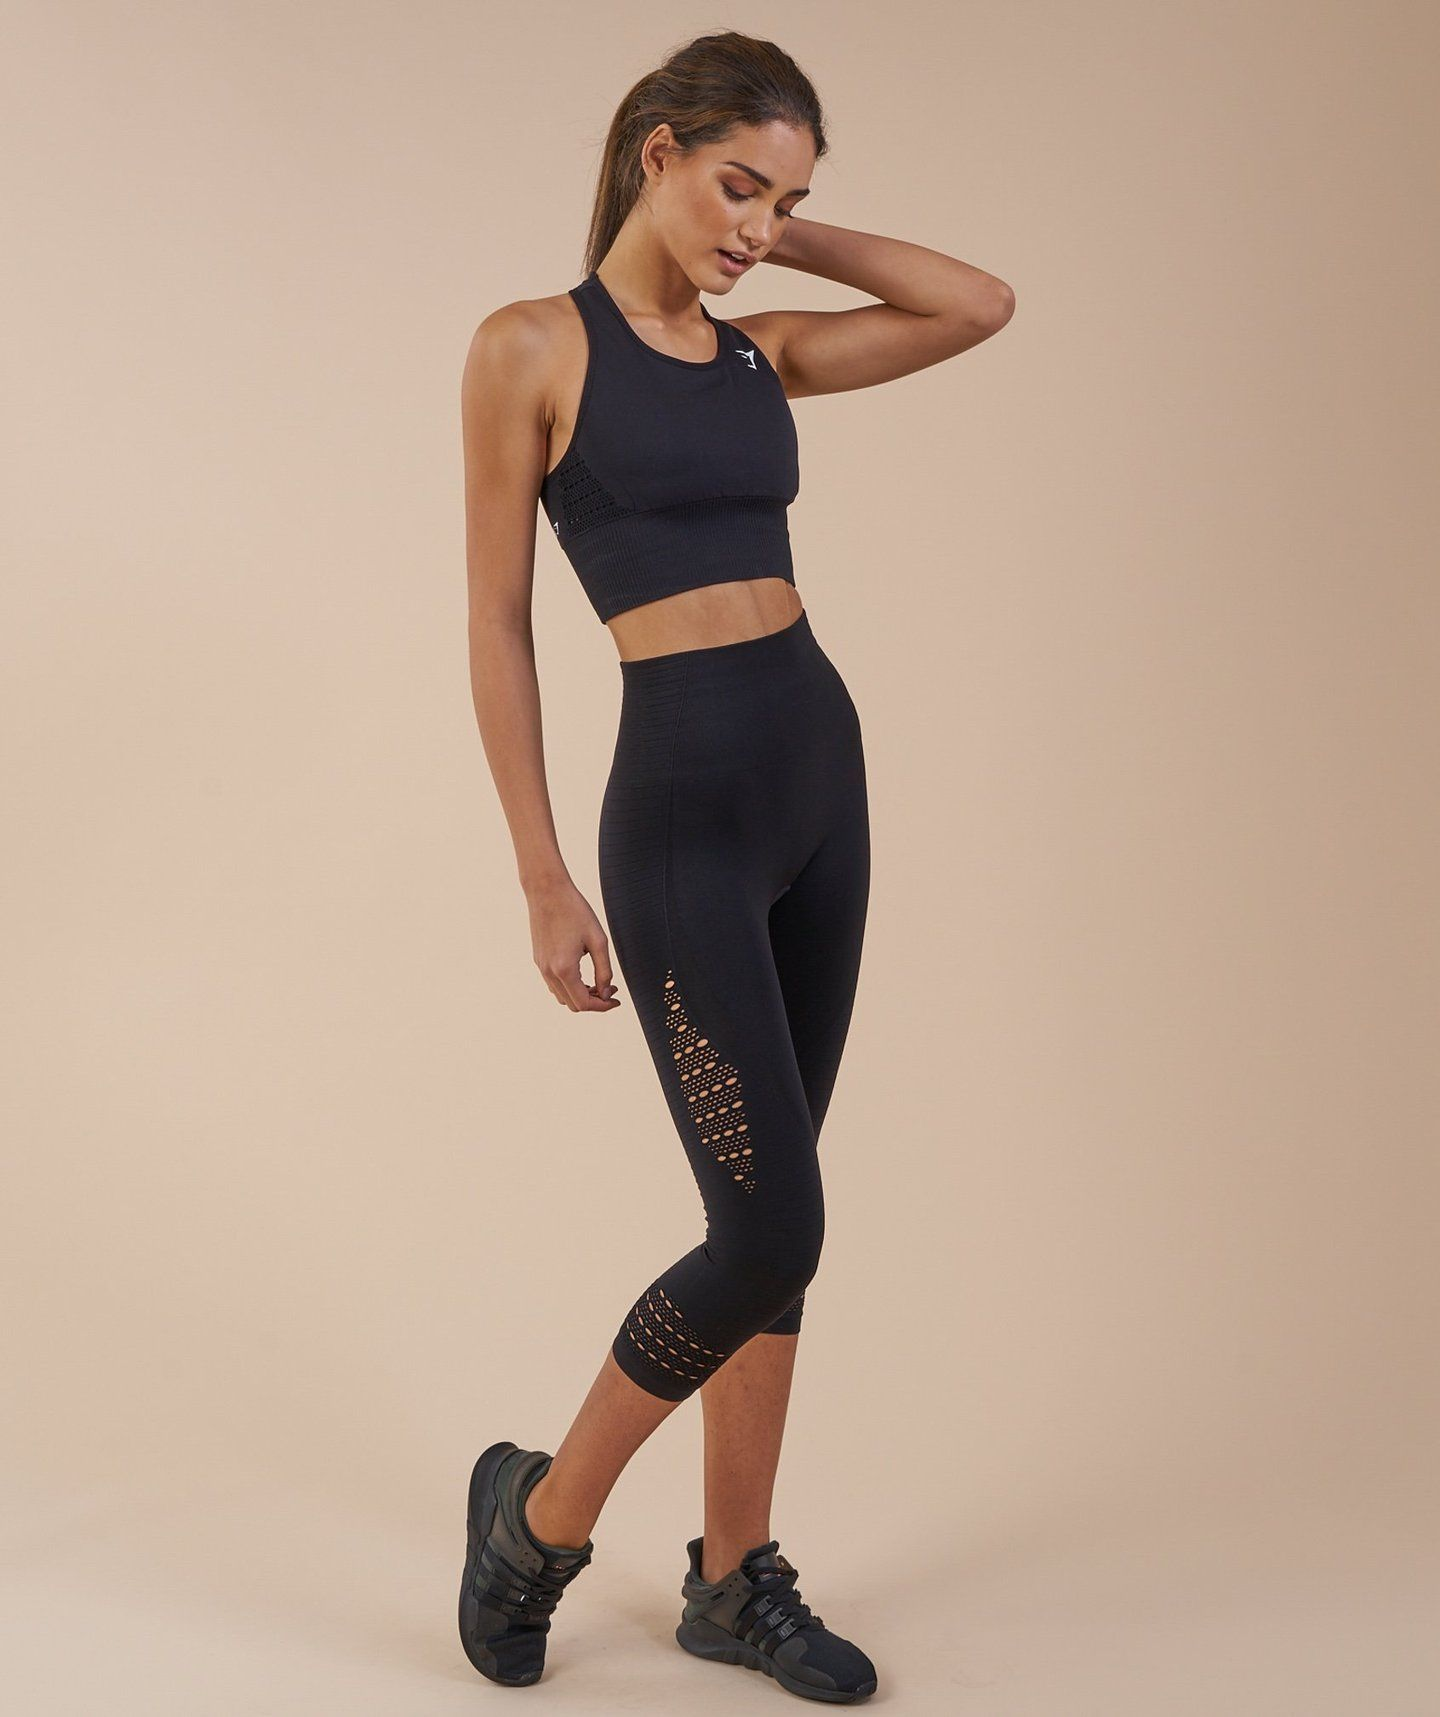 aecd8da86fa50 Gymshark Seamless Energy High Waisted Cropped Leggings - Black 2